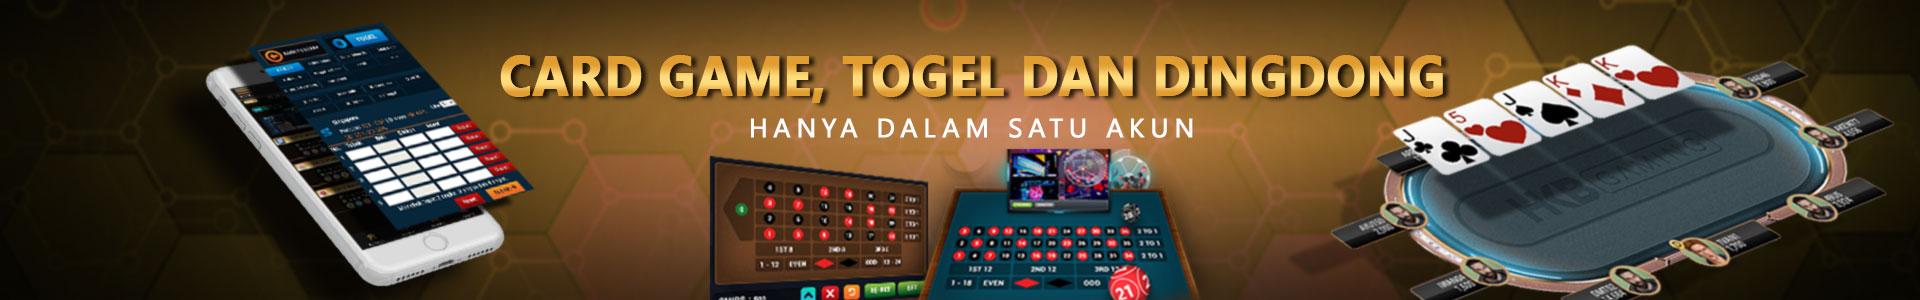 Bandar Casino Online Indonesia Terpercaya